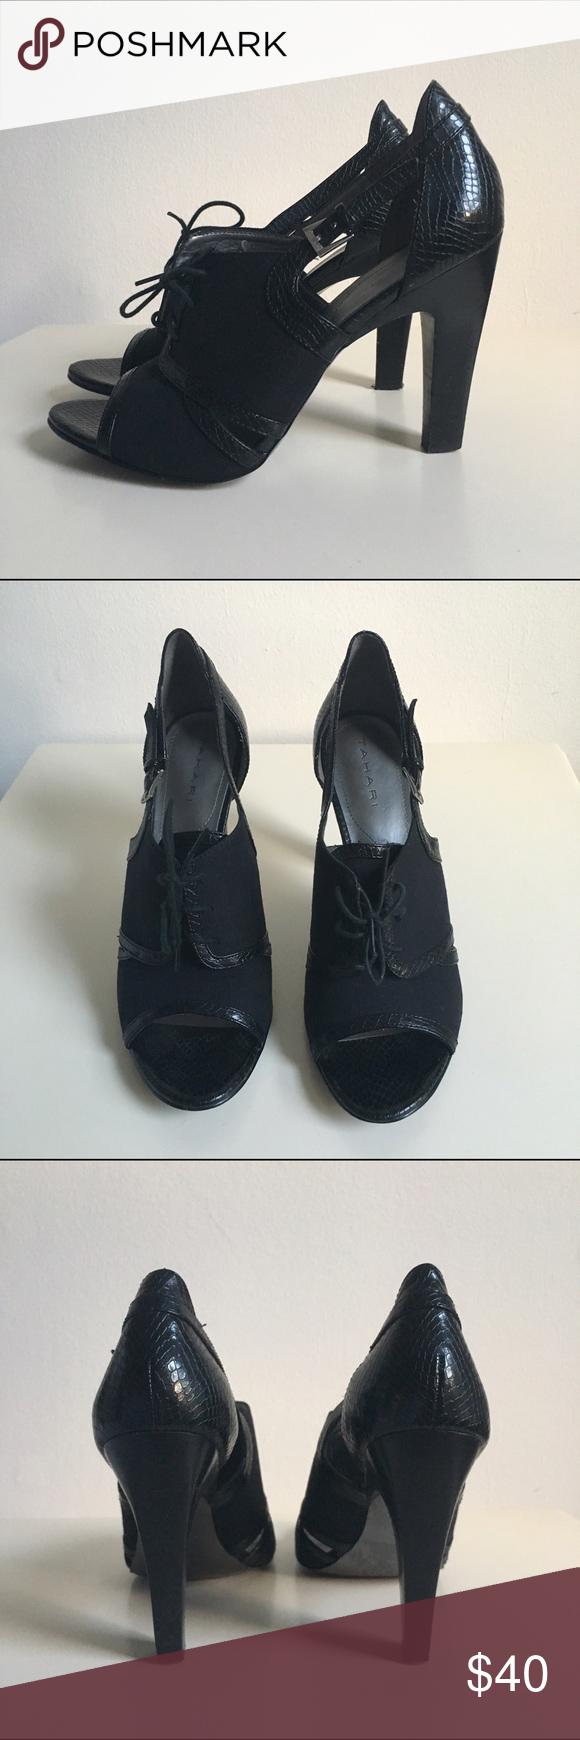 Black laced peep toe heels Super cute heels for any season. Tahari Shoes Heels